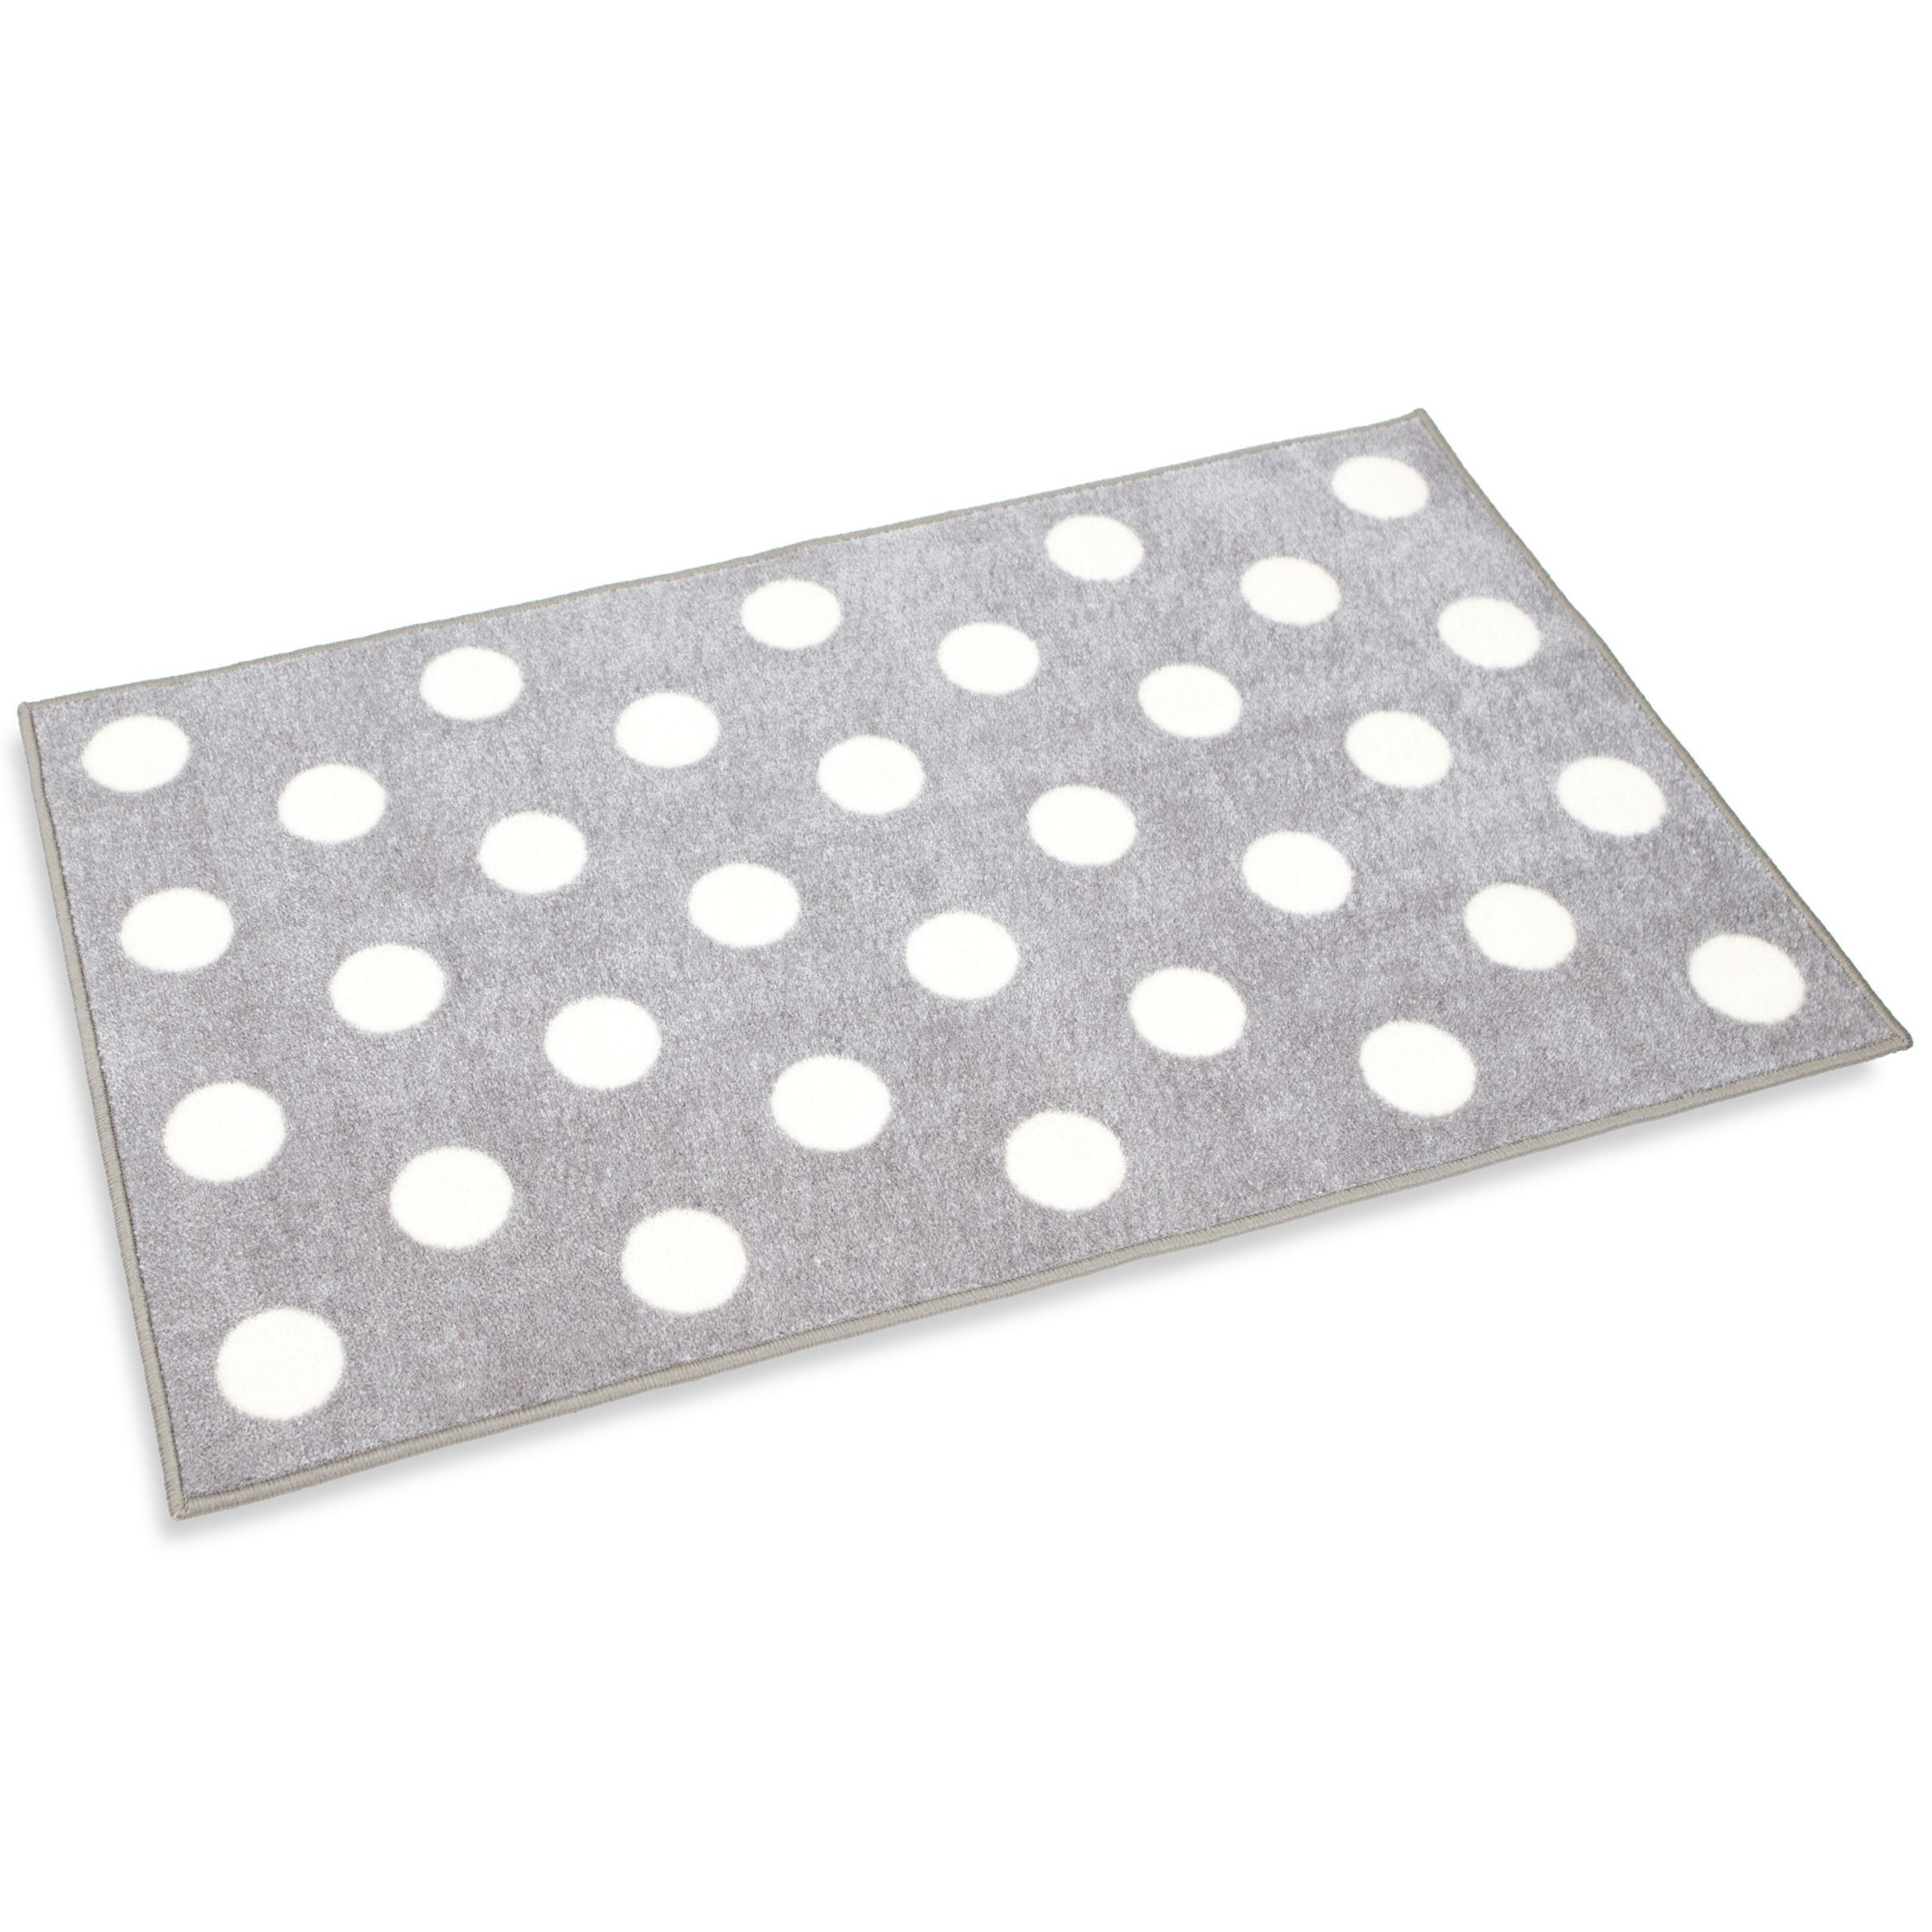 Picture of: Kit For Kids Polka Dot Rug Grey At John Lewis Partners